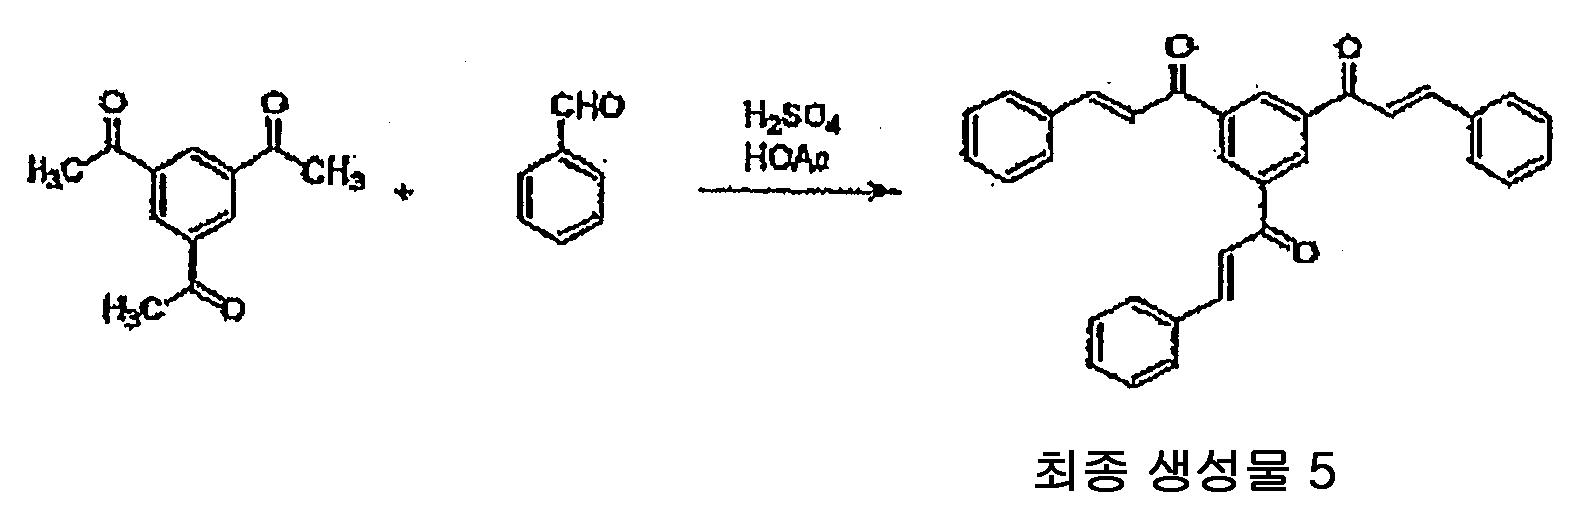 Figure 112010002231902-pat00099